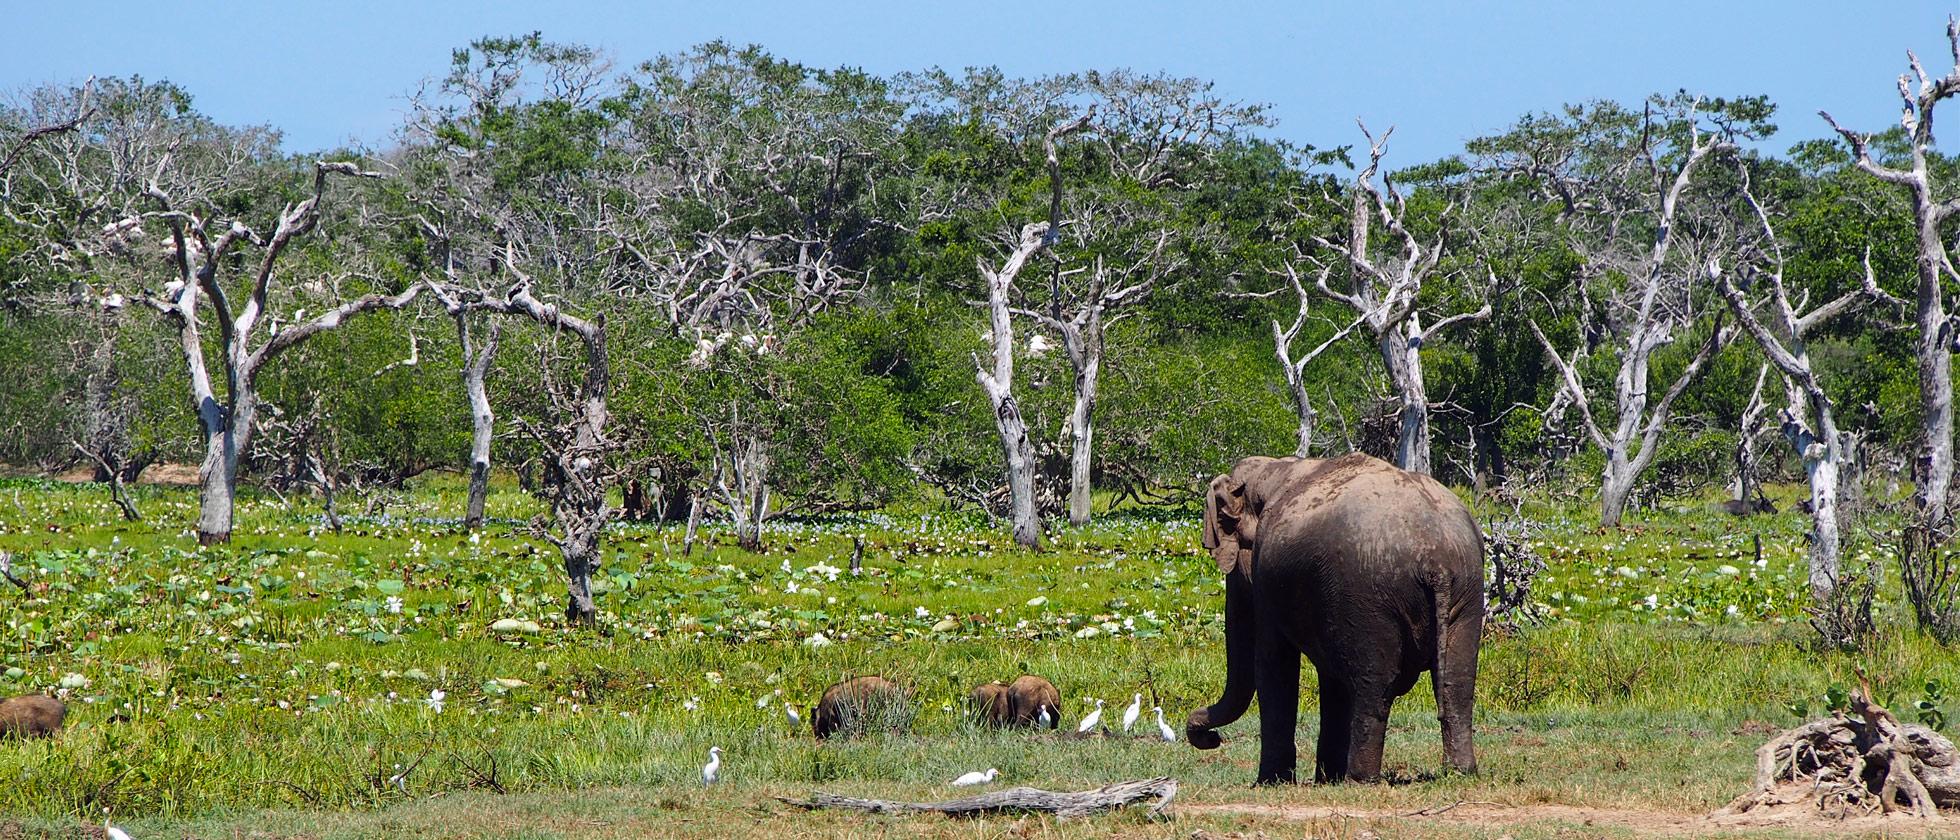 Fotoreportage Yala National Park: Een top safari!